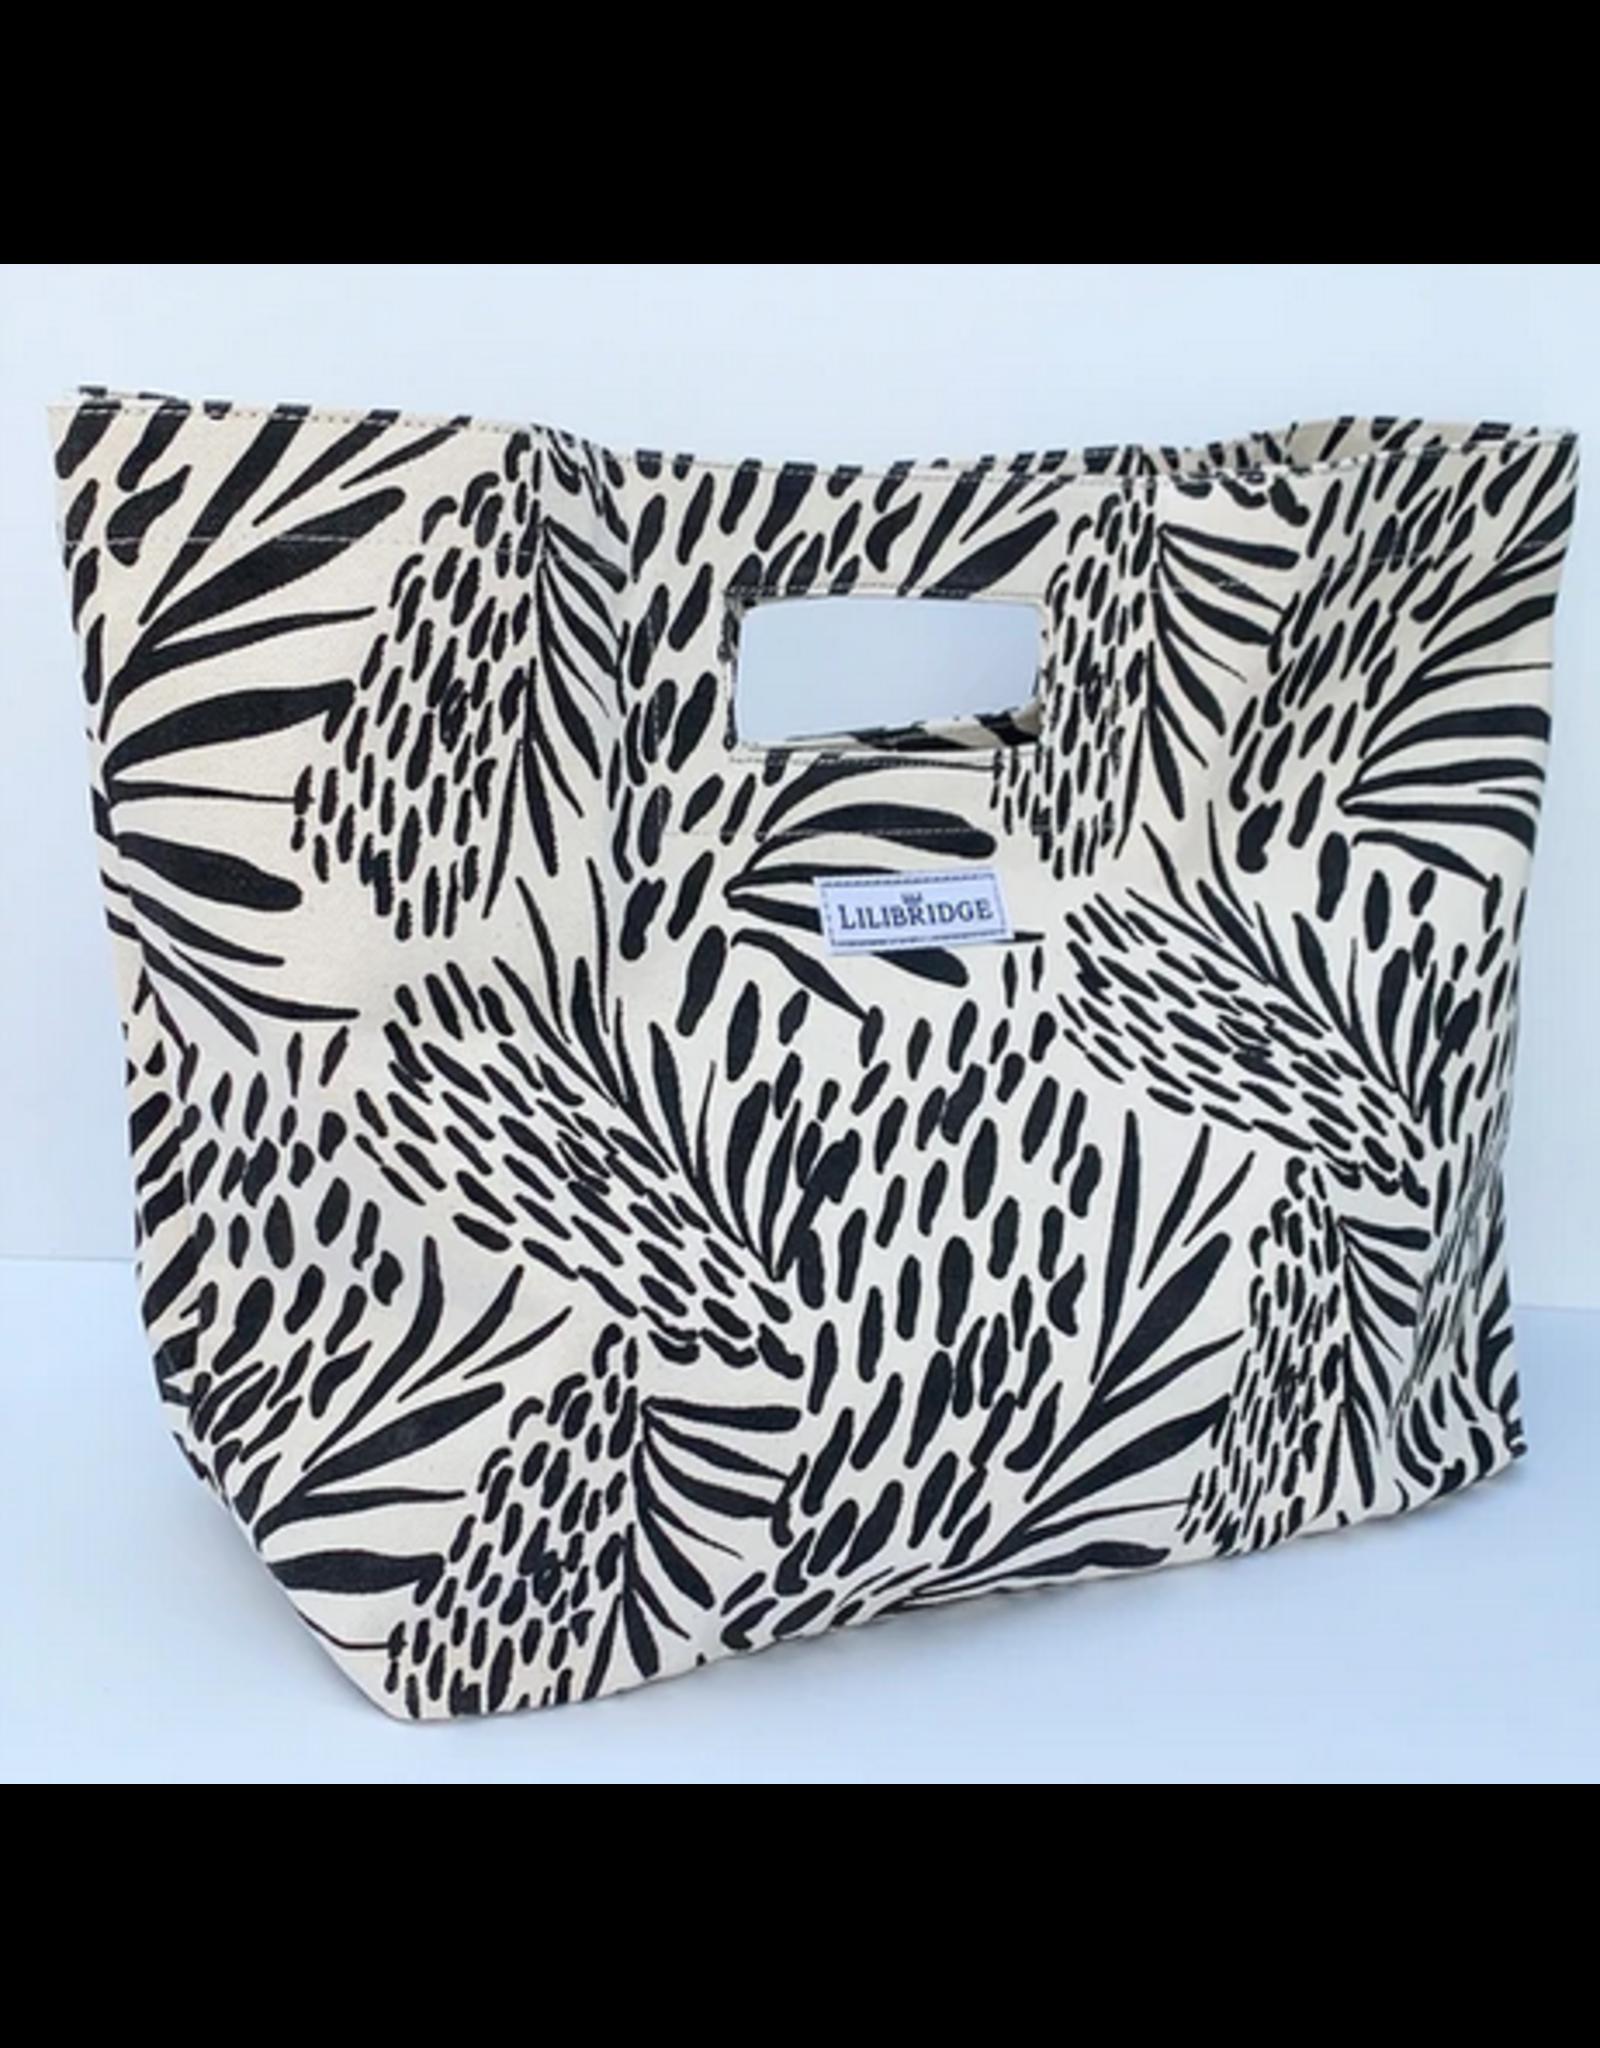 Lilibridge Sea Feather Bag by Lilibridge